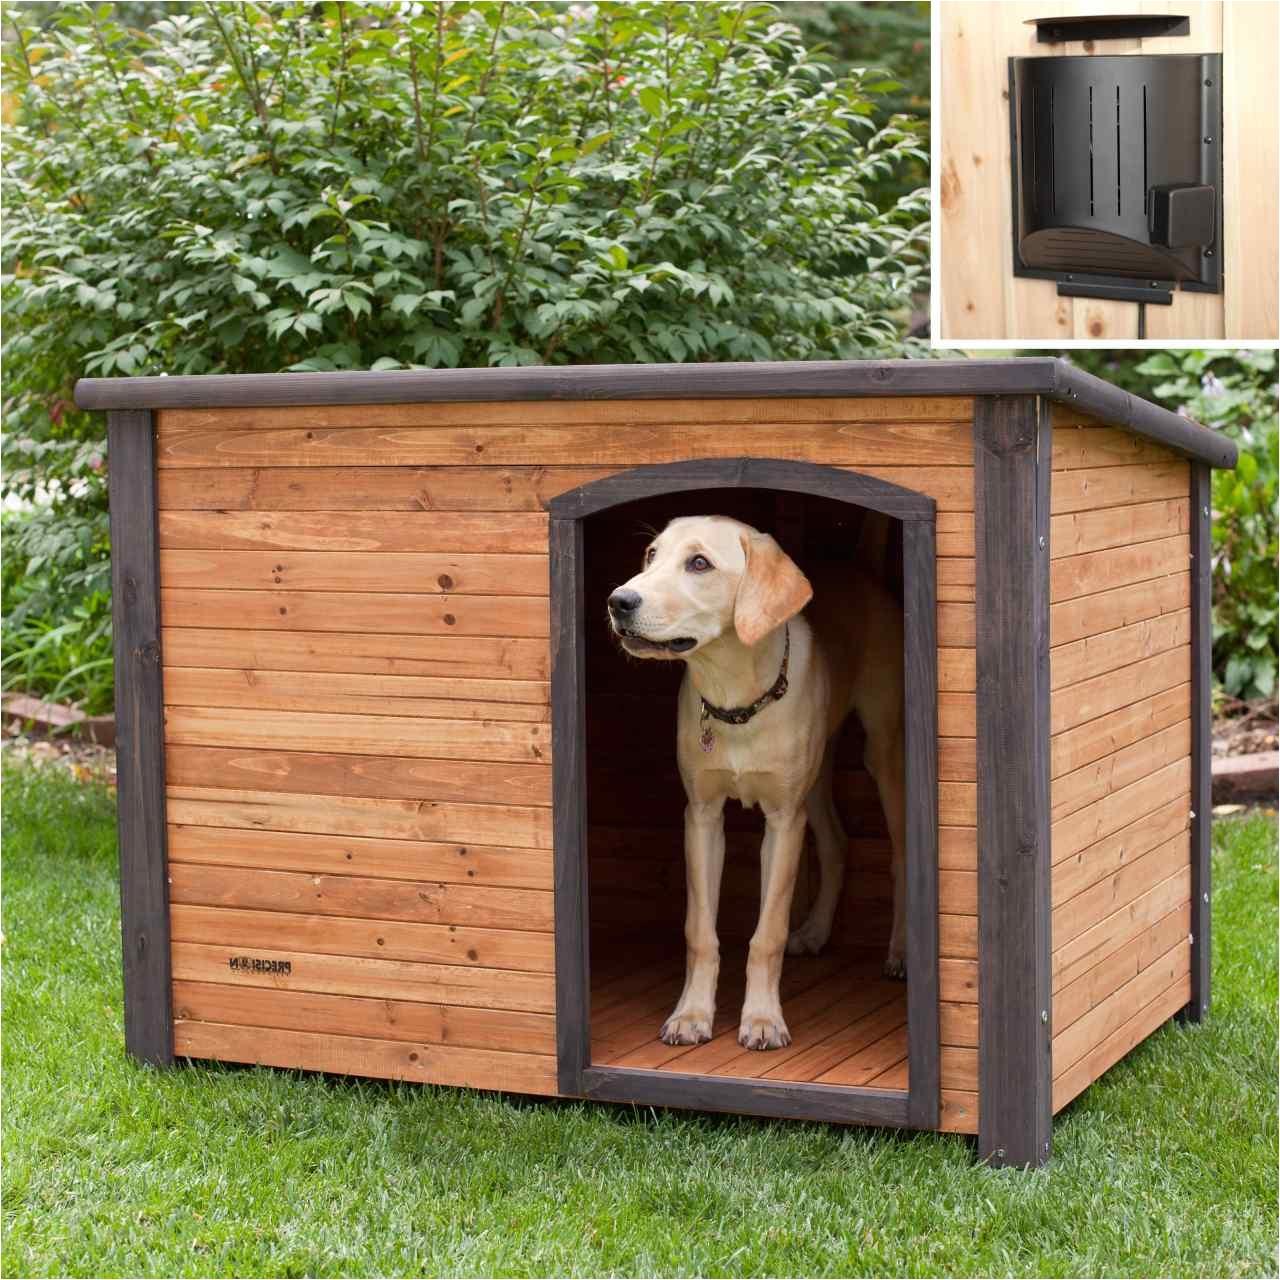 free double dog house plans beautiful homemade dog house ideas dog